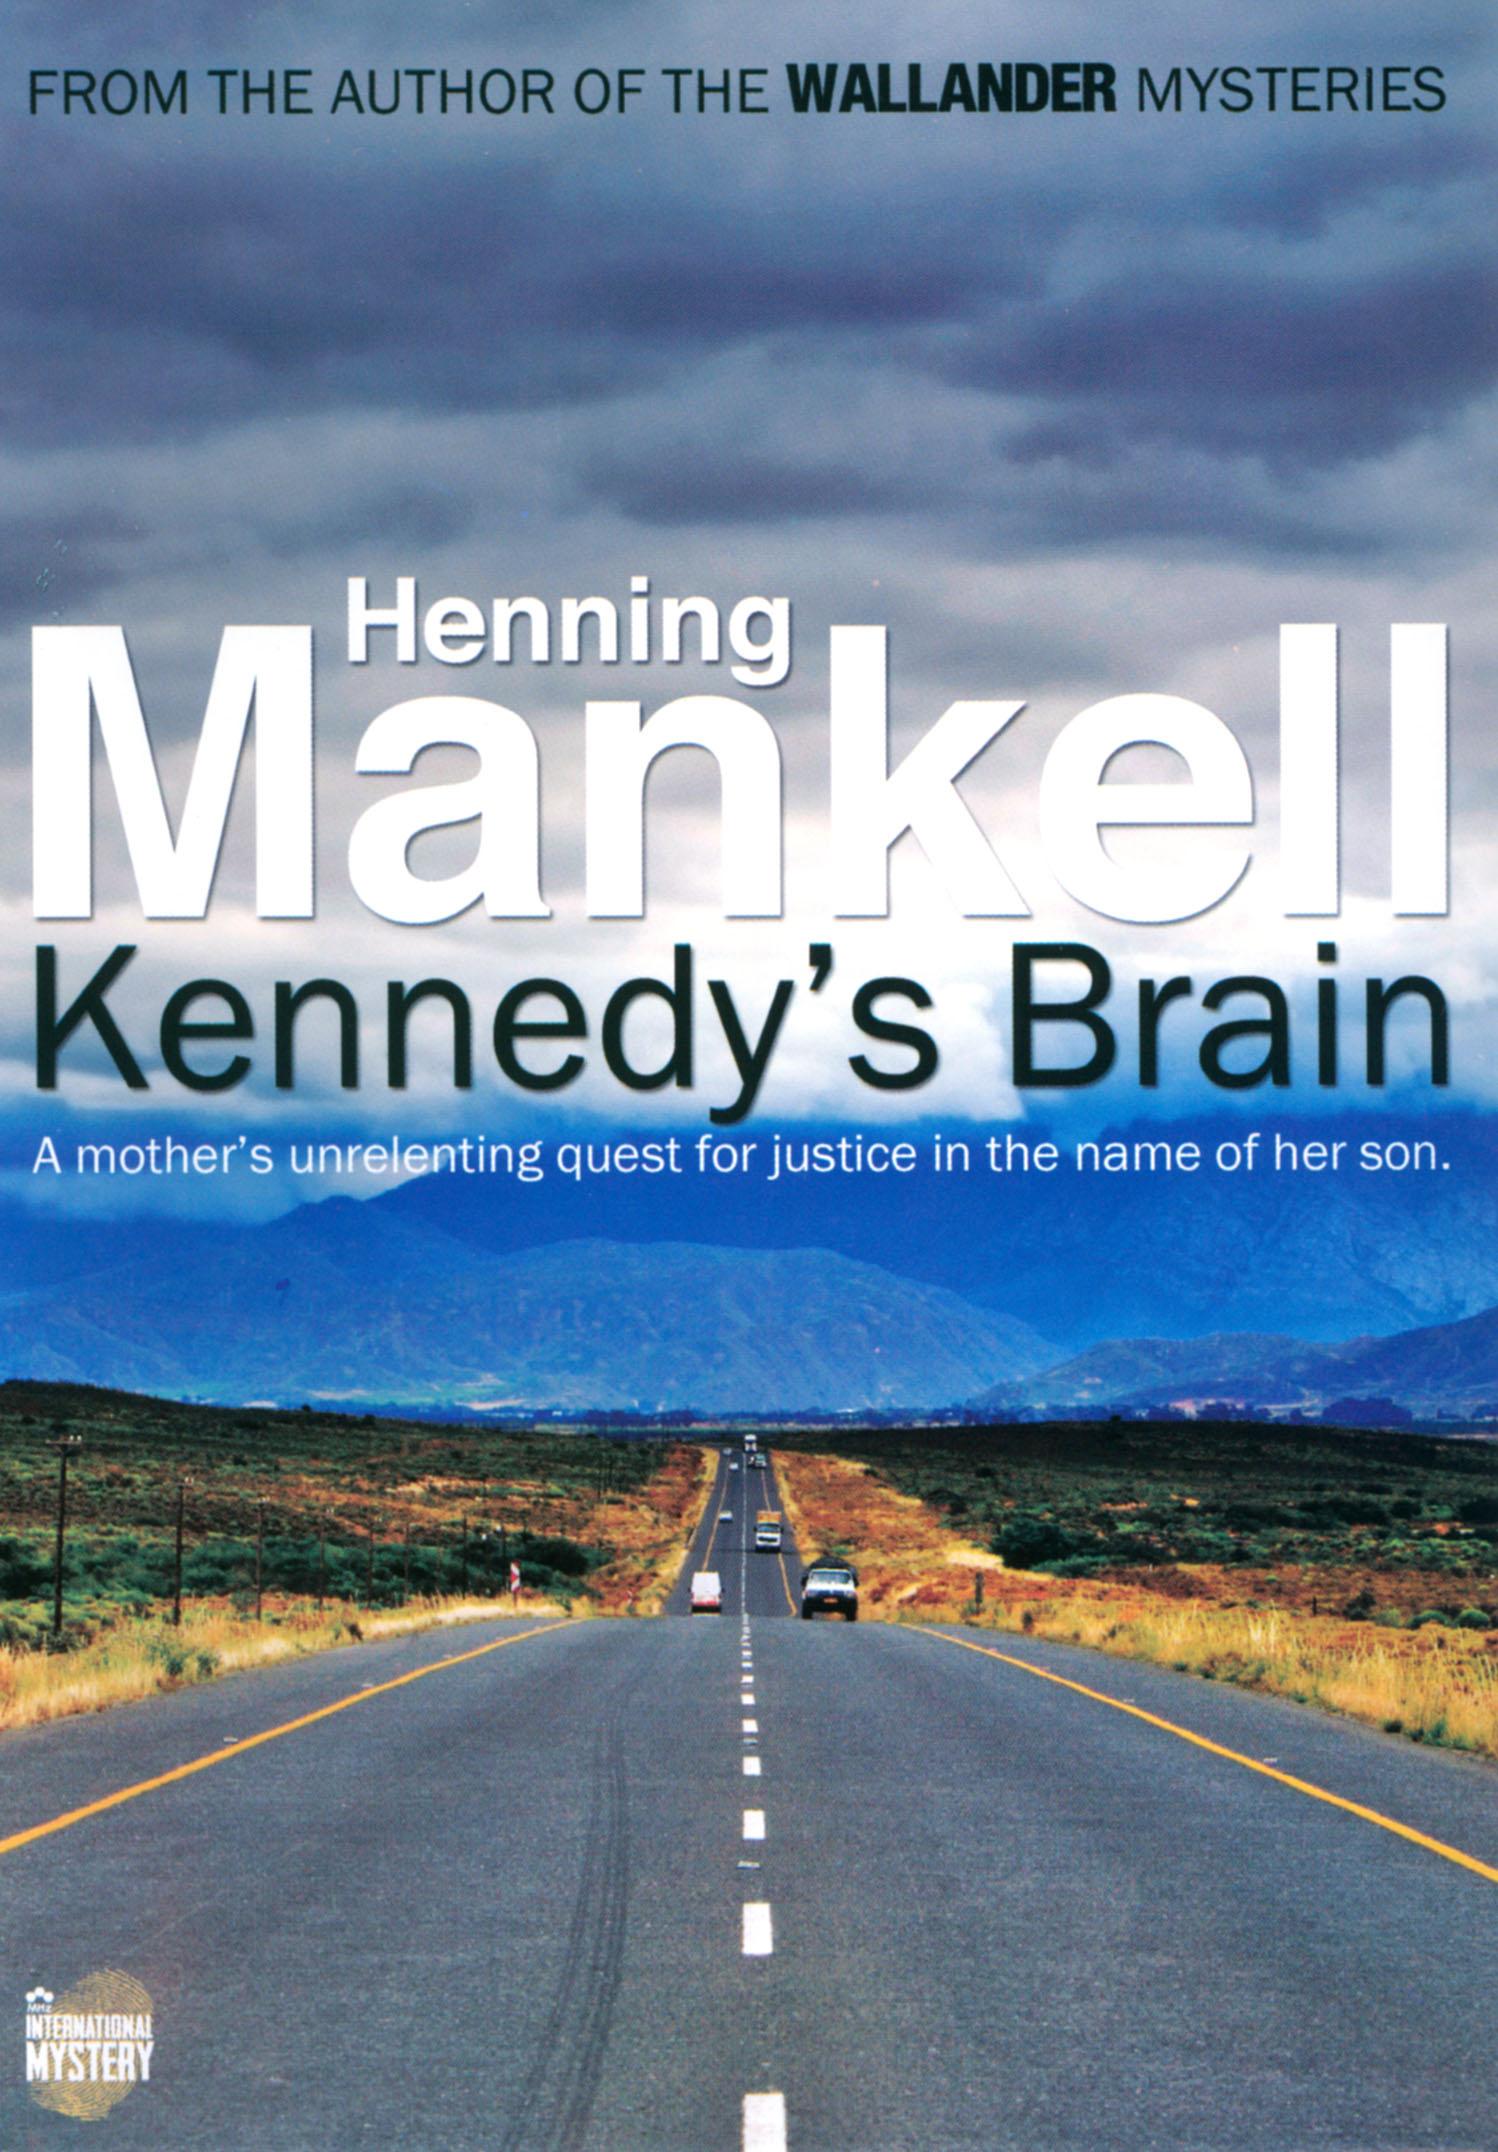 Kennedy's Brain (2010)